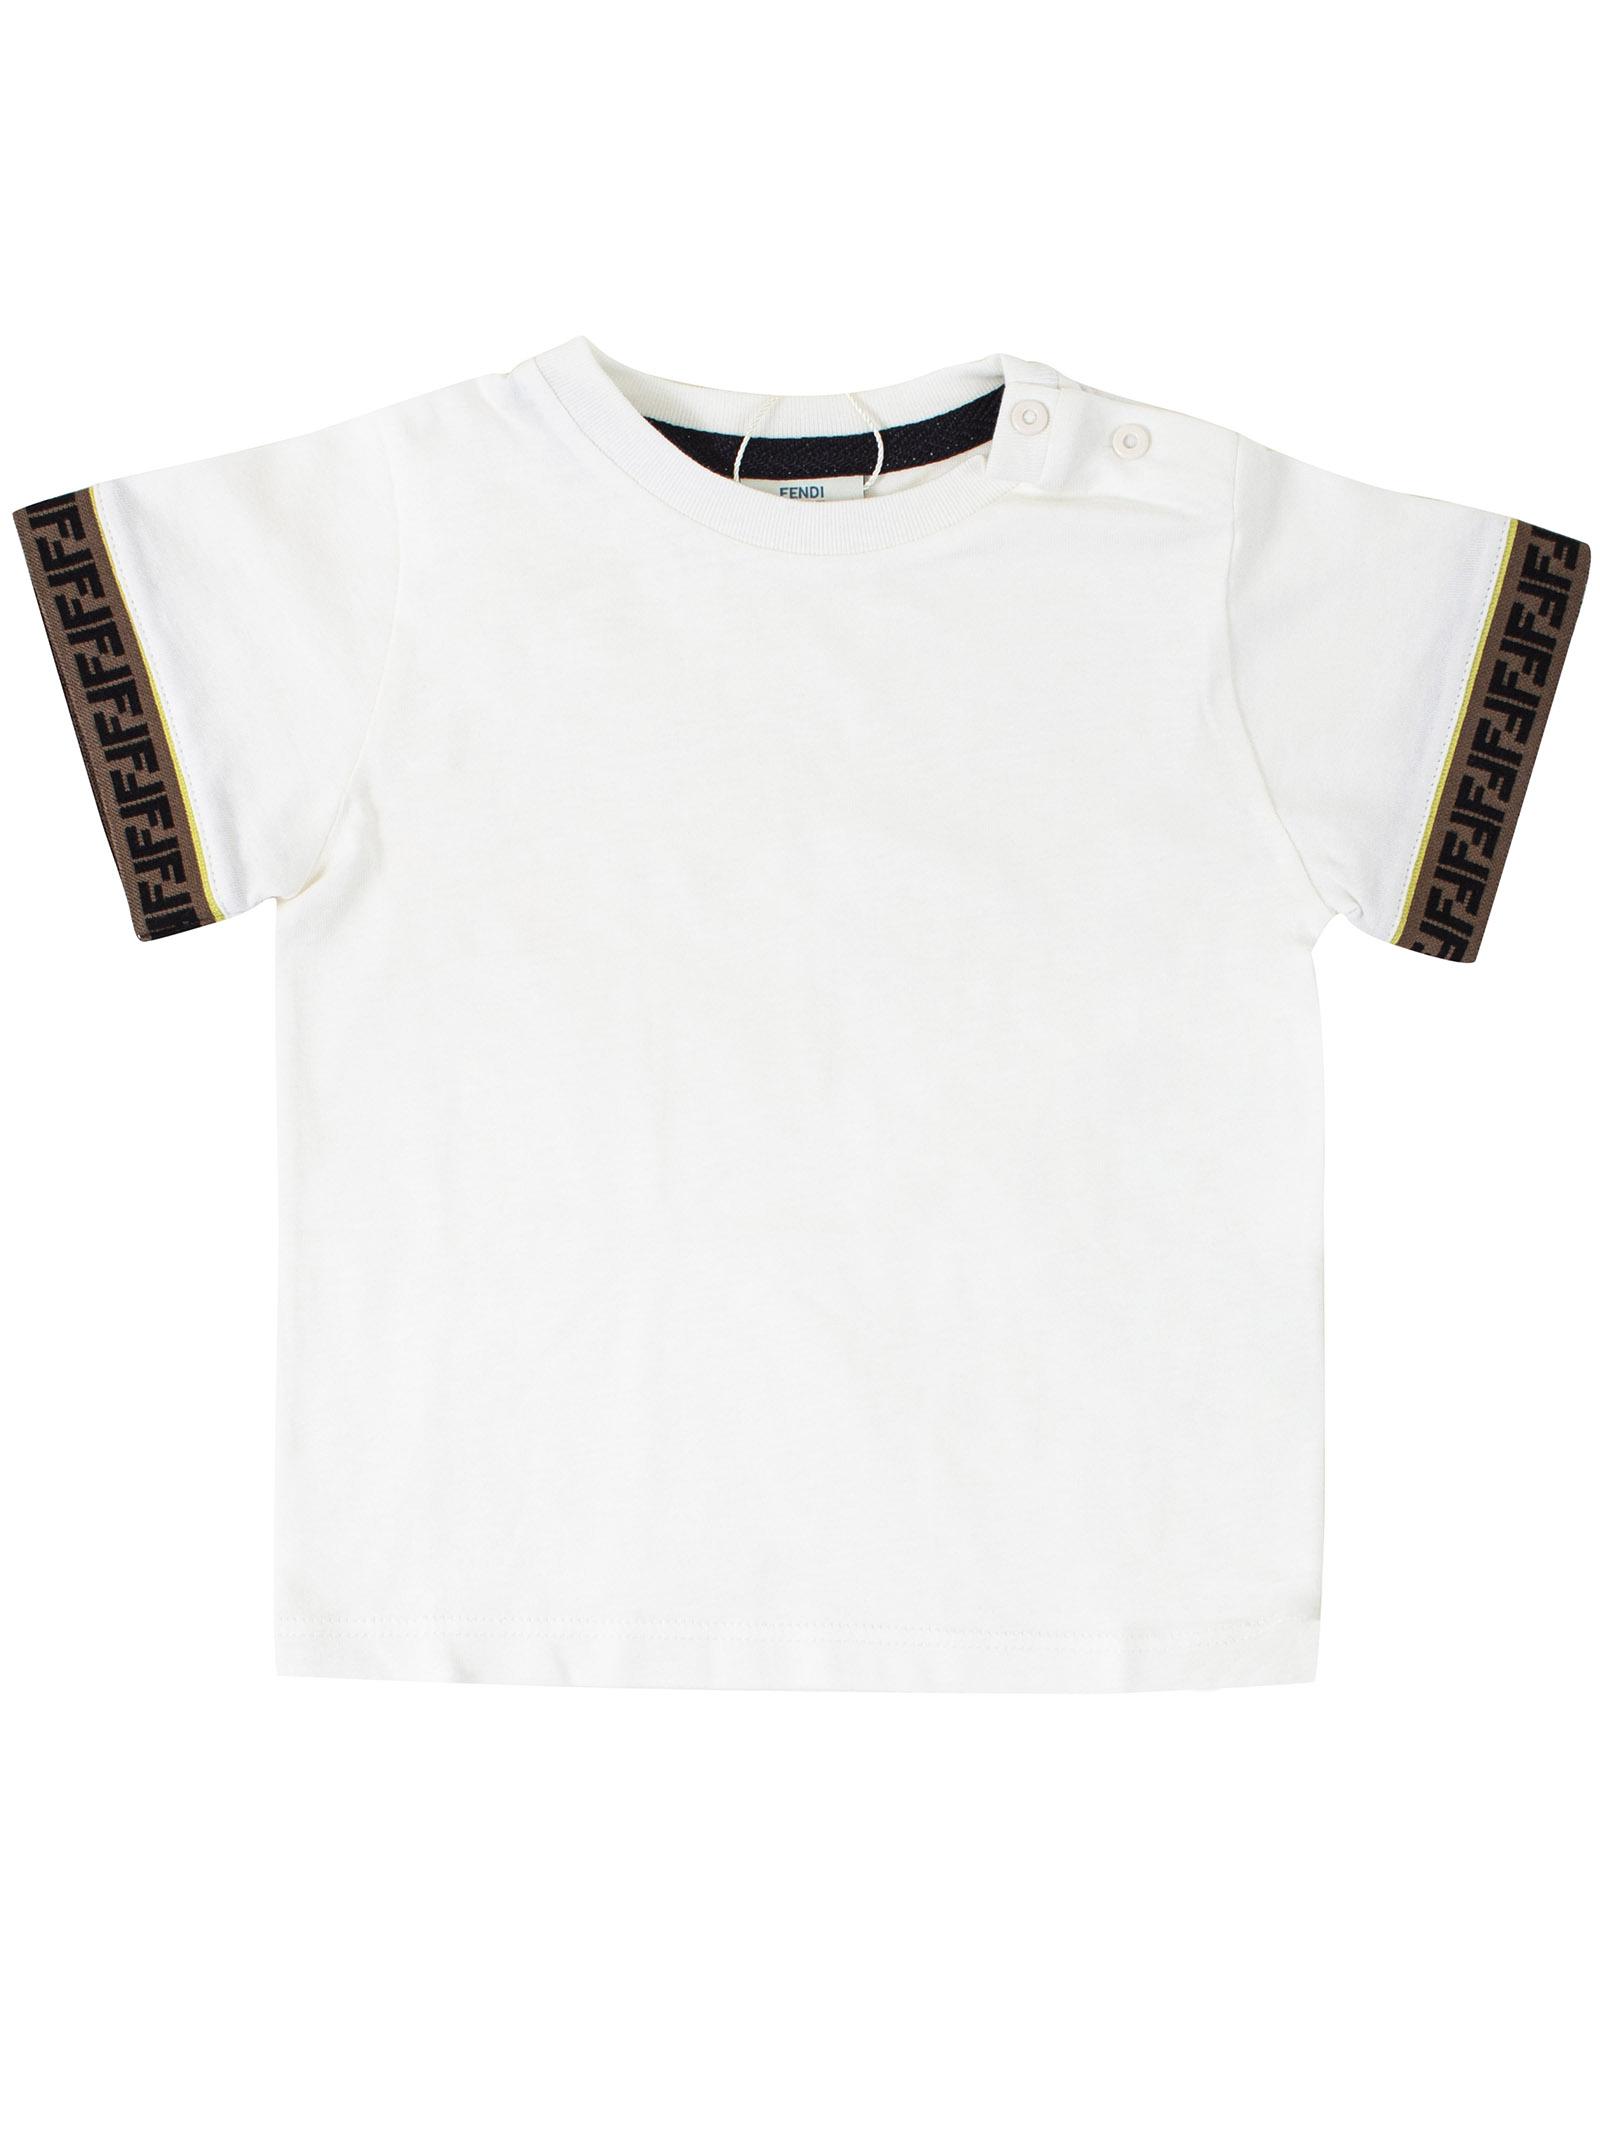 check out 487fb a50d2 T- shirt neonato